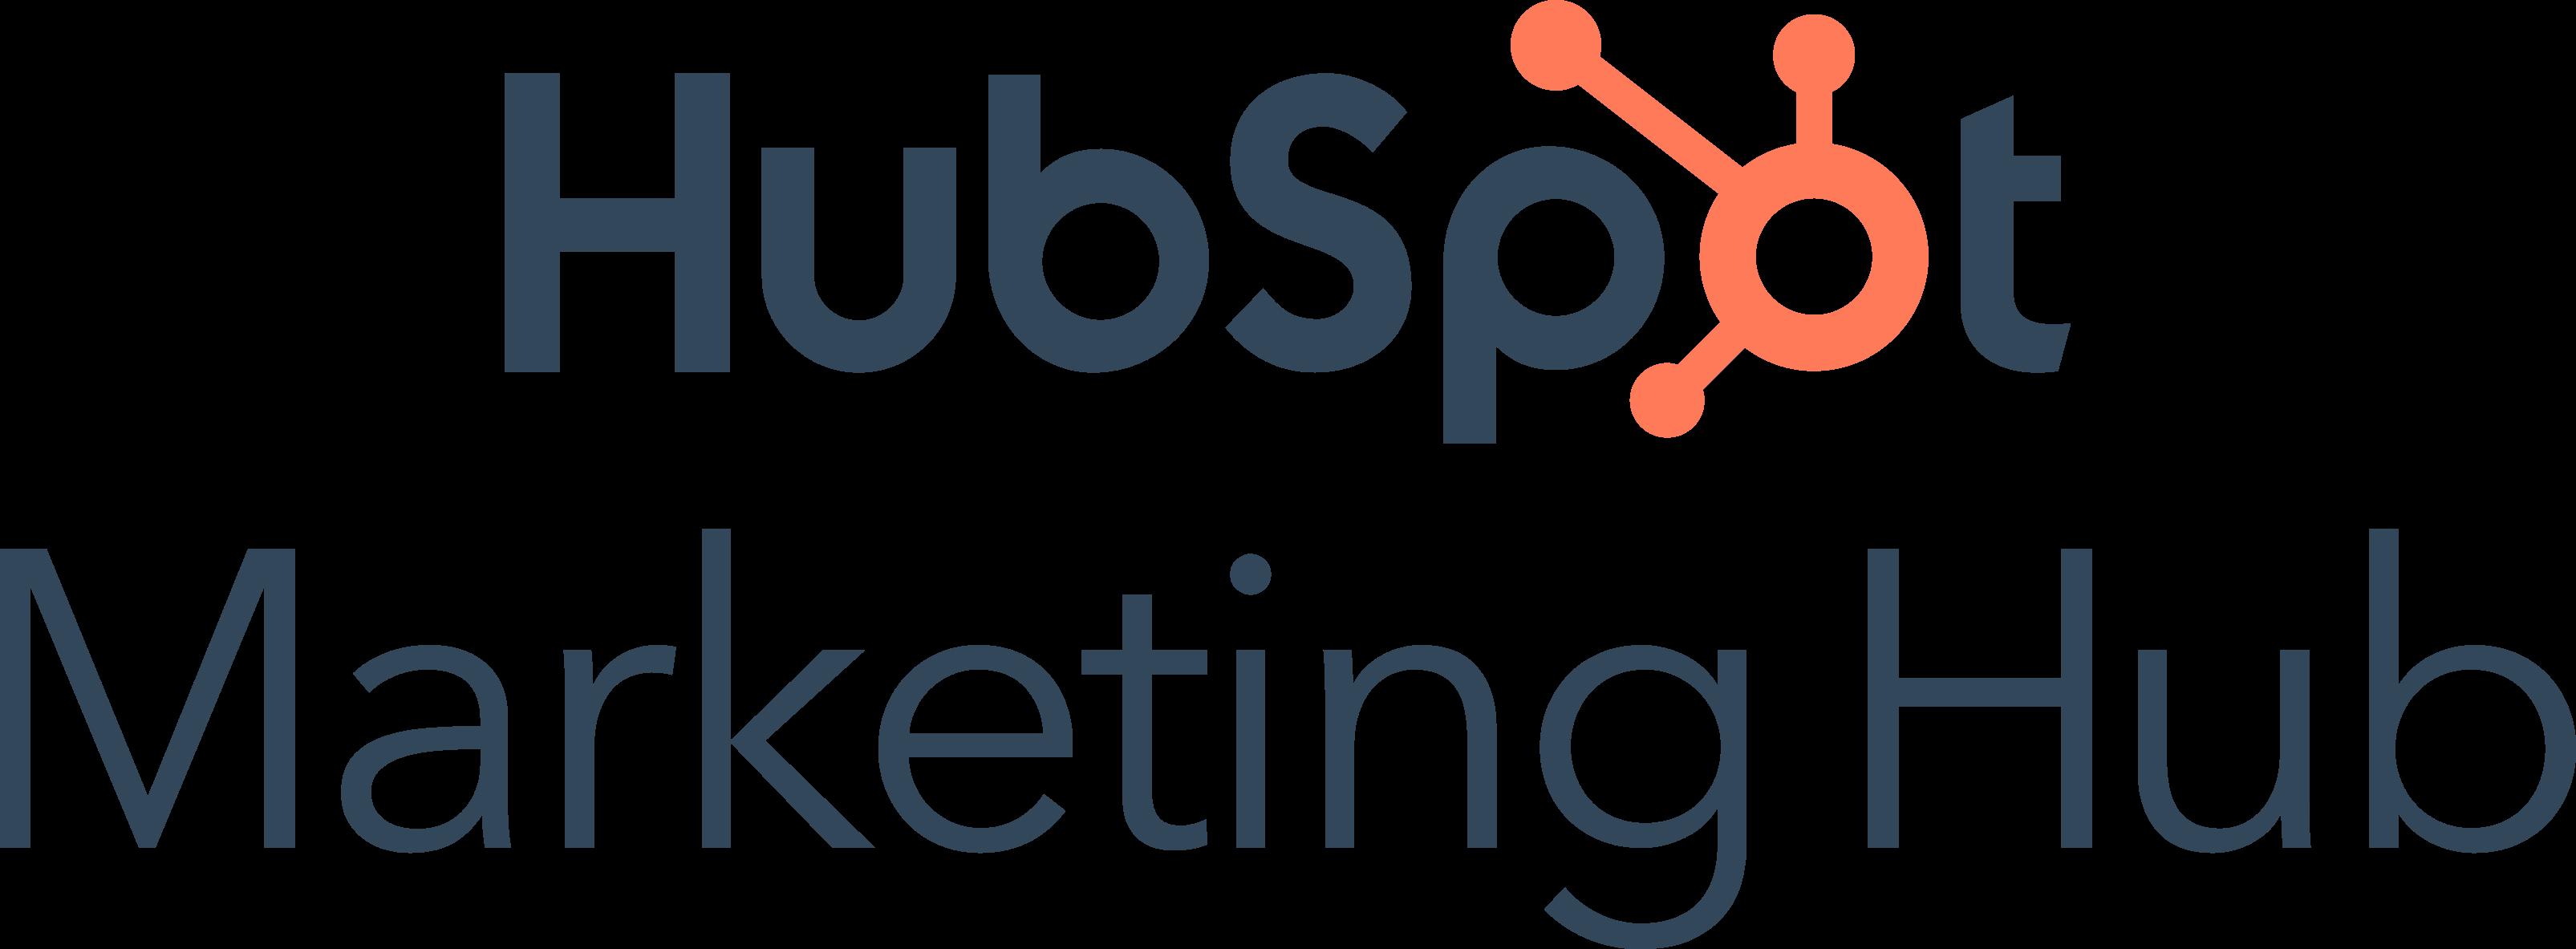 marketinghub-web-color-centeraligned-1